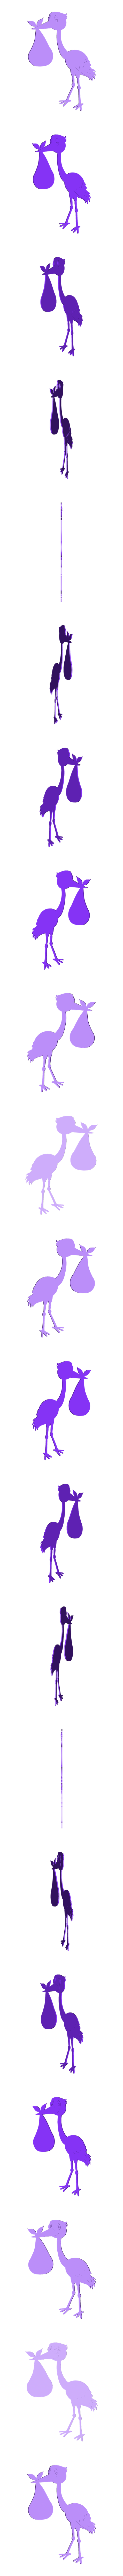 Stork.stl Download free STL file Stork Figure • 3D printable template, JMDesign